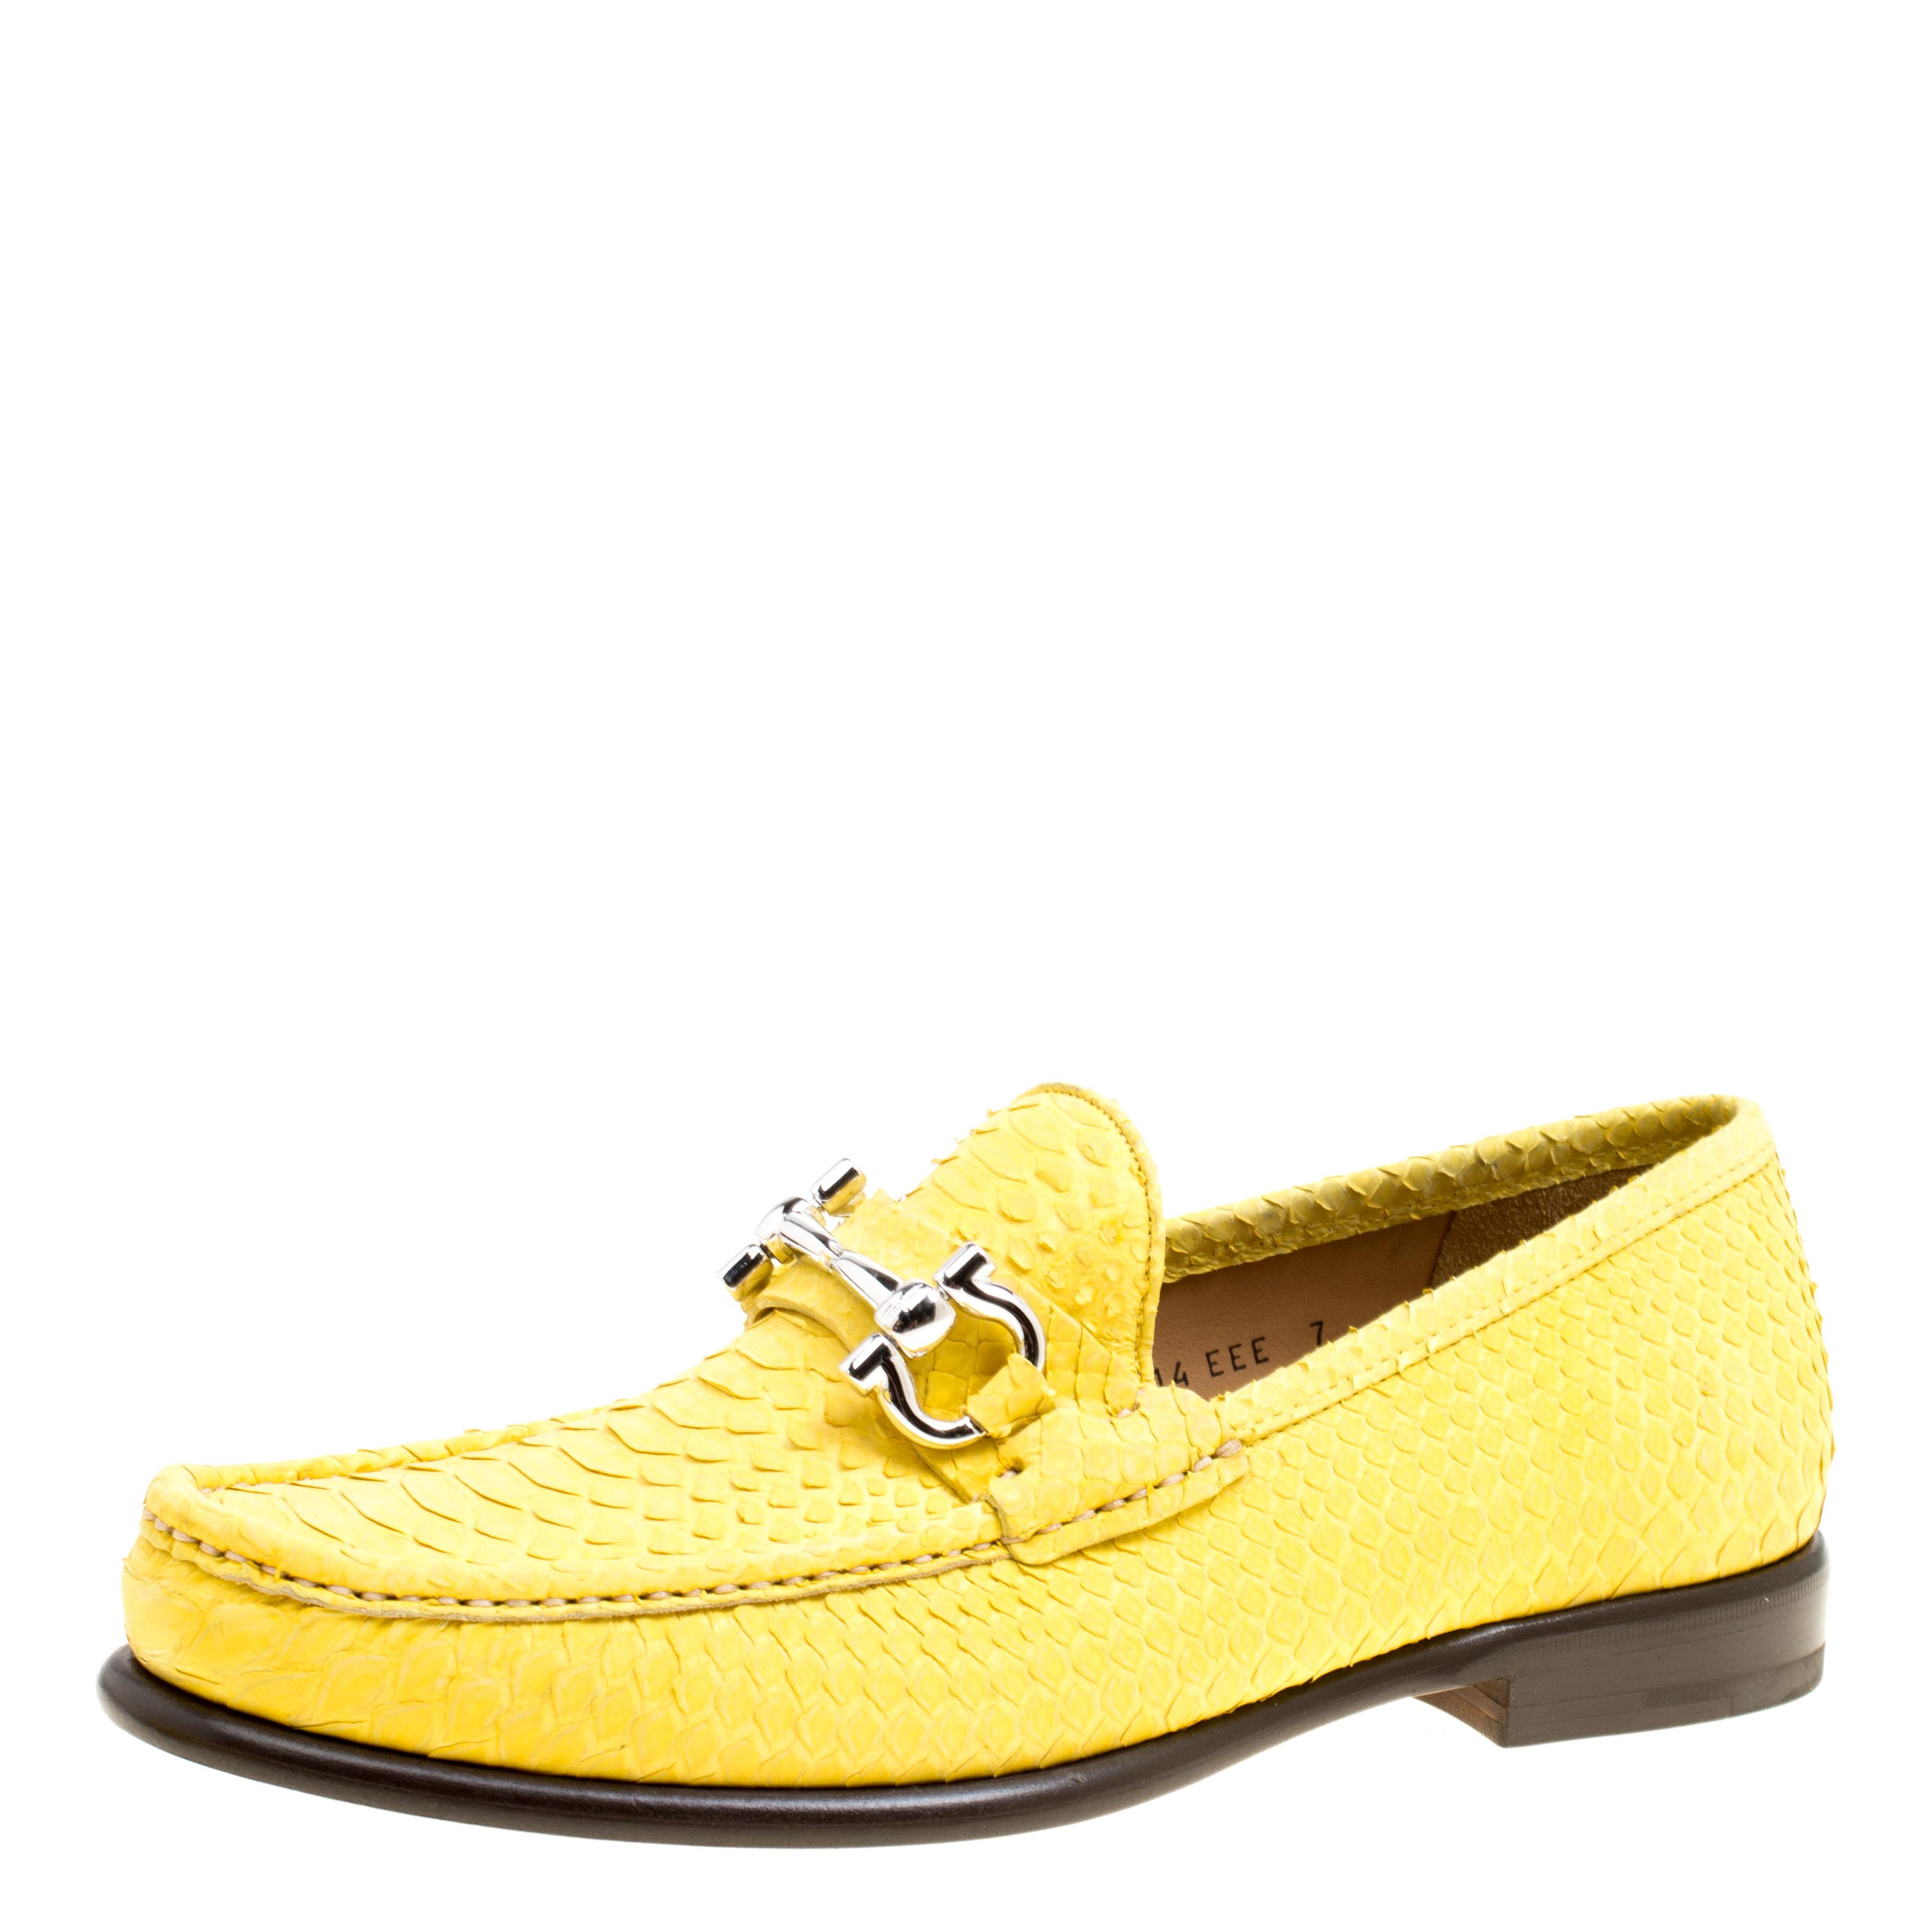 Salvatore Ferragamo Yellow Python Mason Loafers Size 41